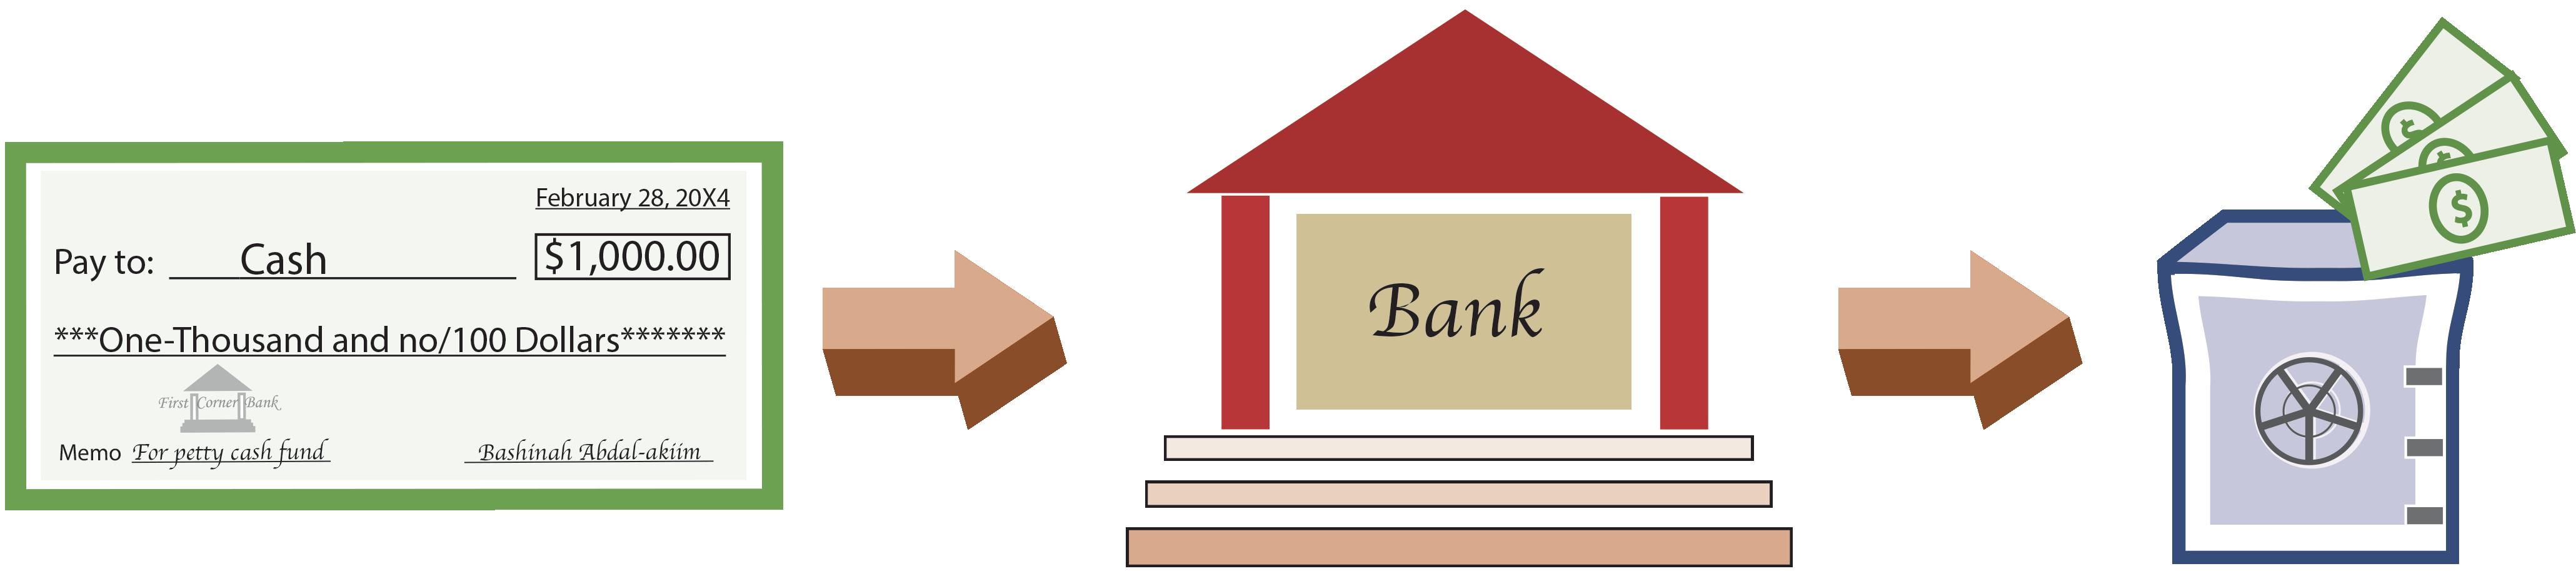 Principlesofaccounting com illustration. Cash clipart petty cash